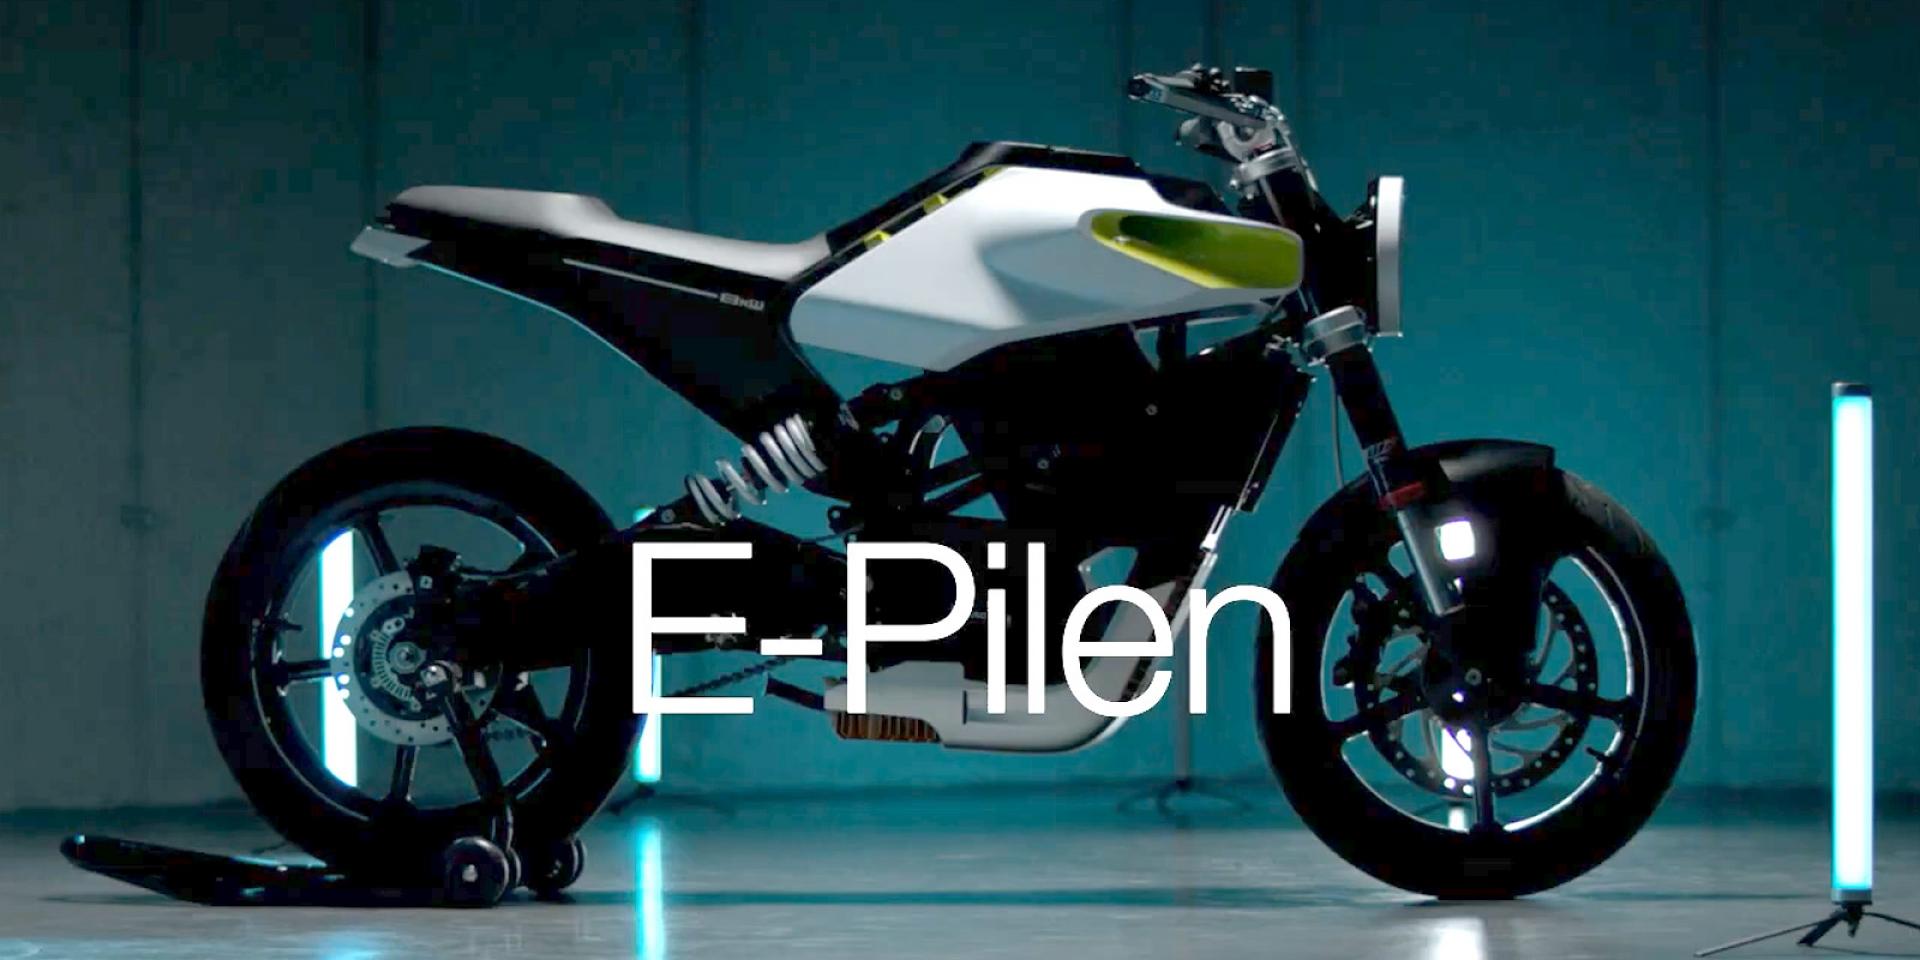 8kW馬達、交換電池設計。Husqvarna E-Pilen 電動概念車現身!